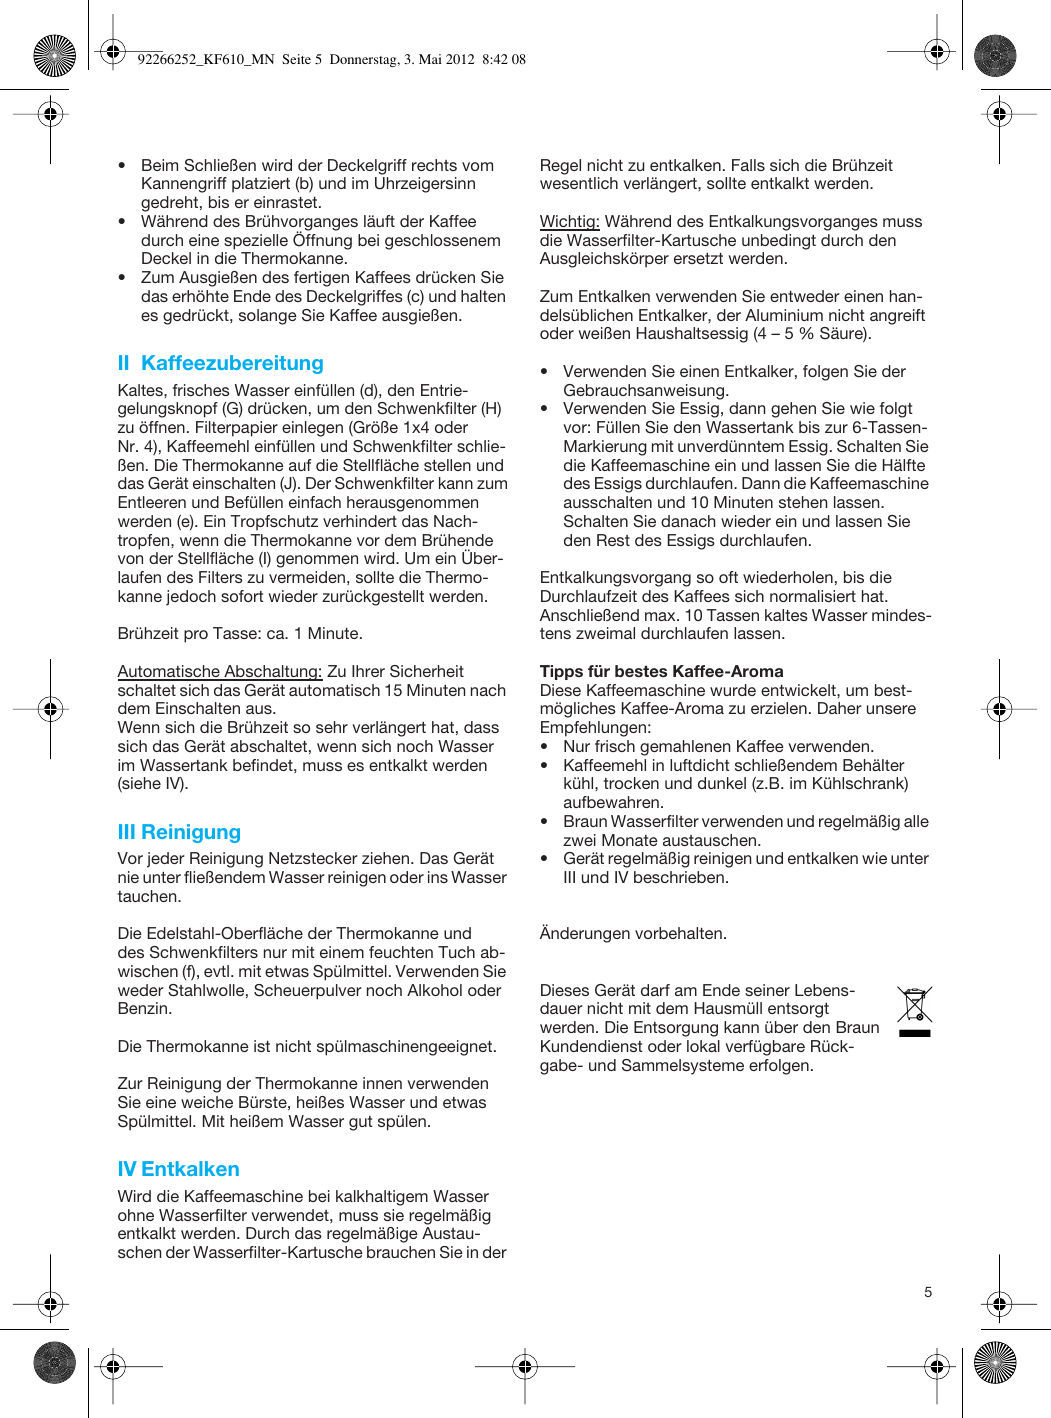 Braun Kf610 Instruction Manual 92266252_KF610_S01